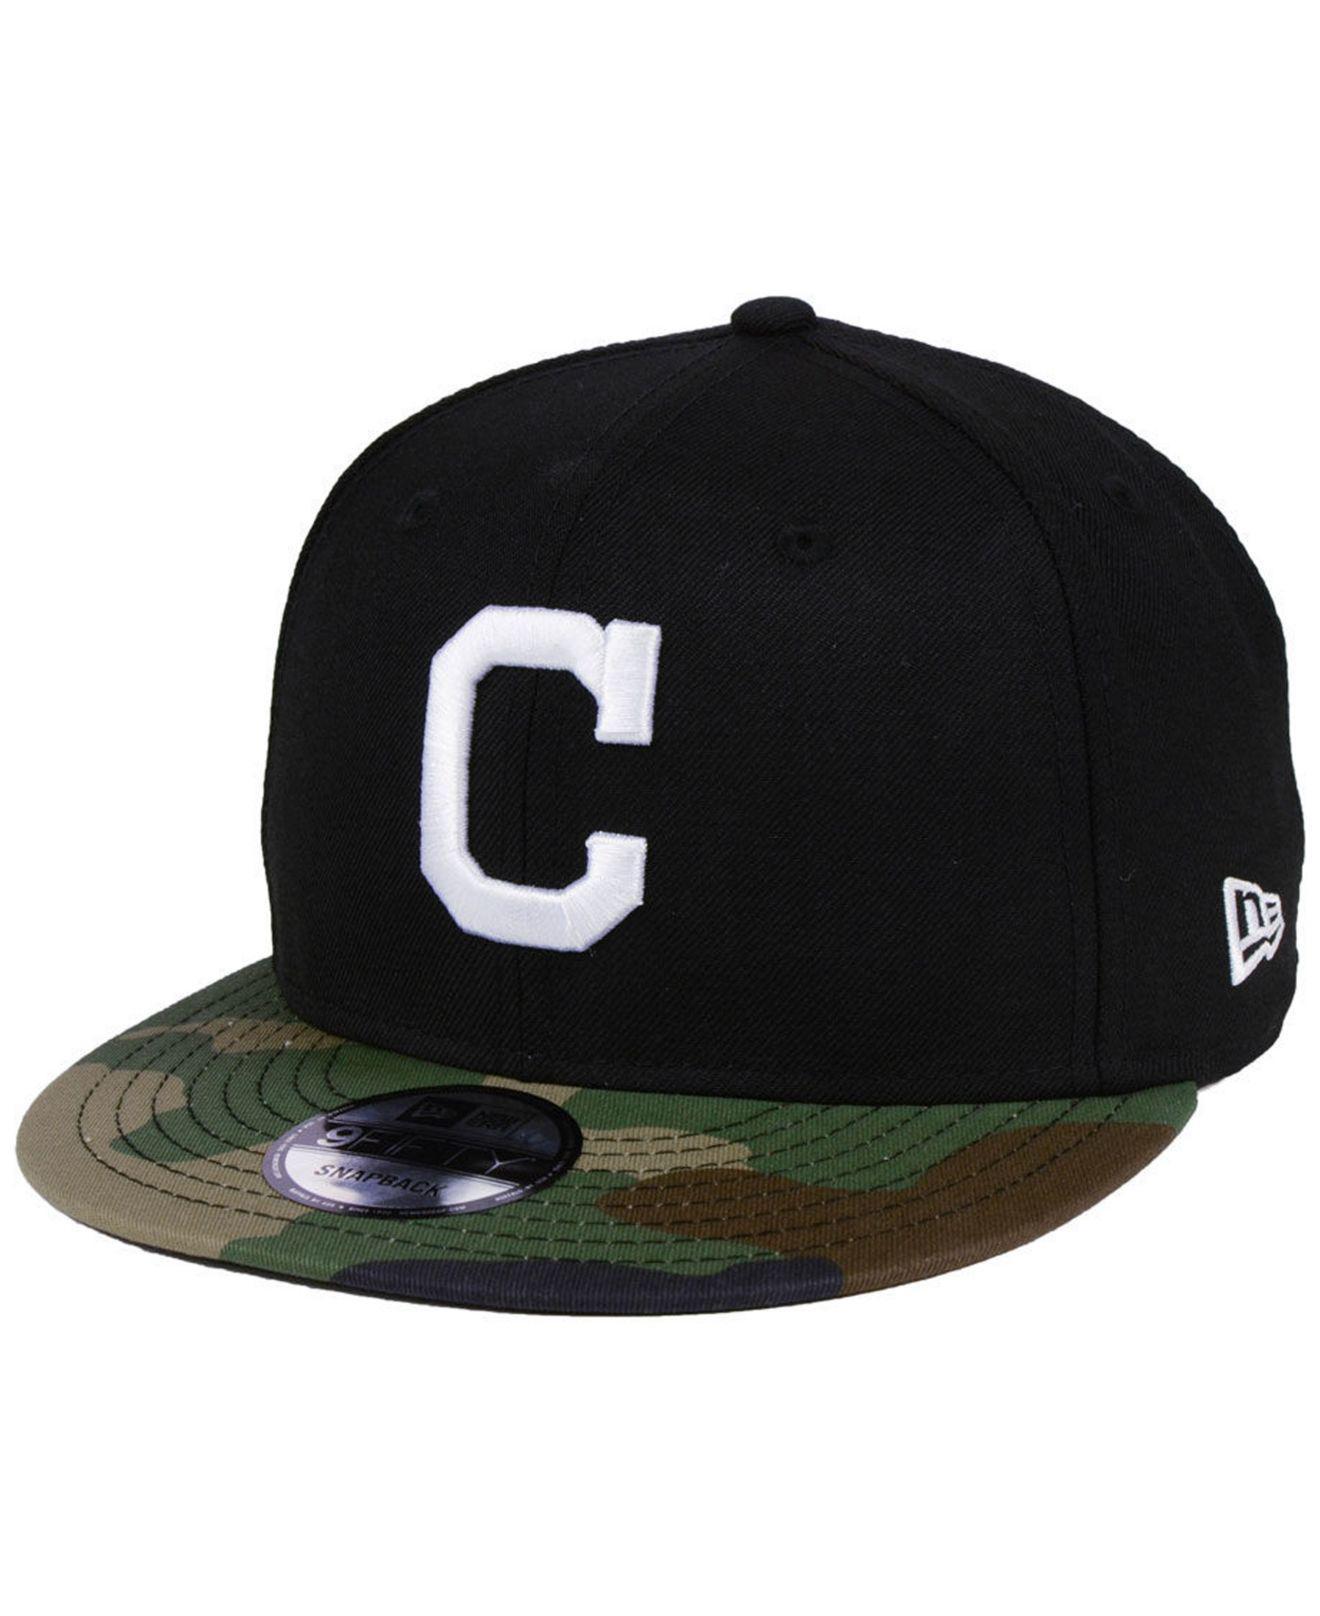 finest selection 42156 255b3 KTZ. Men s Cleveland Indians Woodland Black white 9fifty Snapback Cap